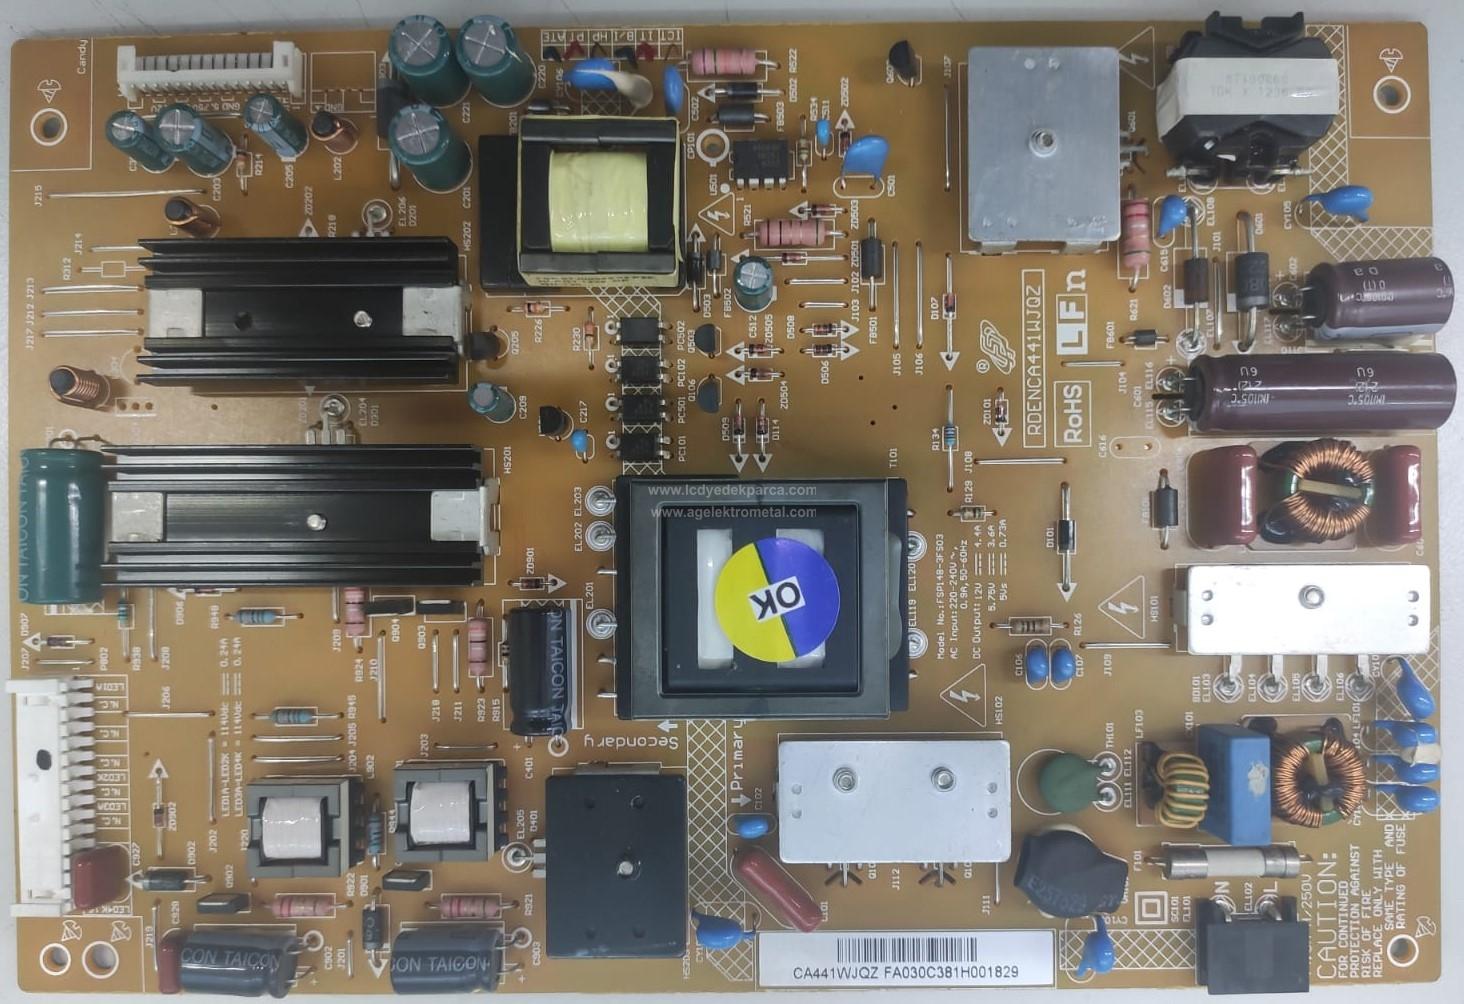 FSP148-3FS03 , 3BS0319510HF , RDENCA441WJQZ , SHARP , LK400D3LB43 , Power Board , Besleme Kartı , PSU